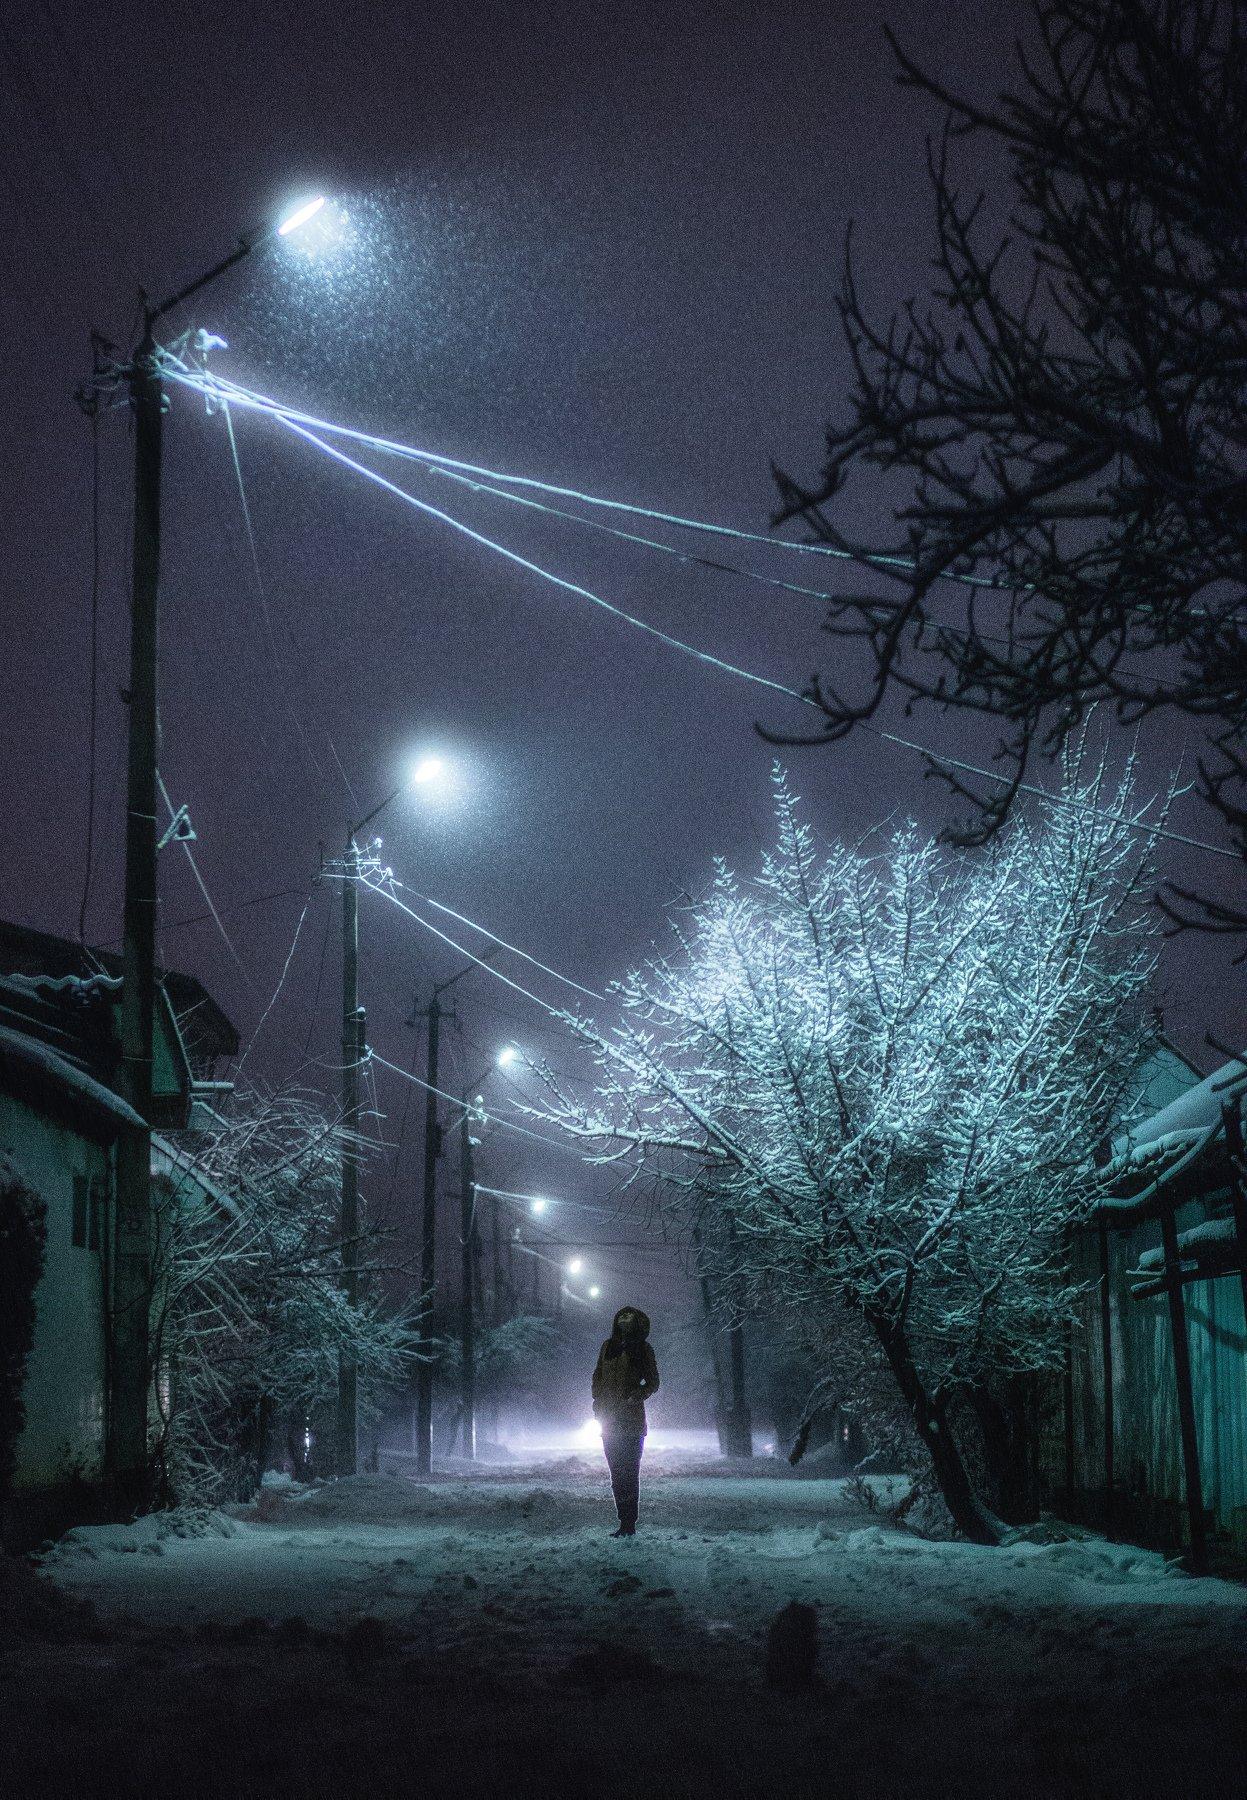 зима, ночь, снег, улица, лампа, street, night, winter, snowfall, Марат Сайранбаев